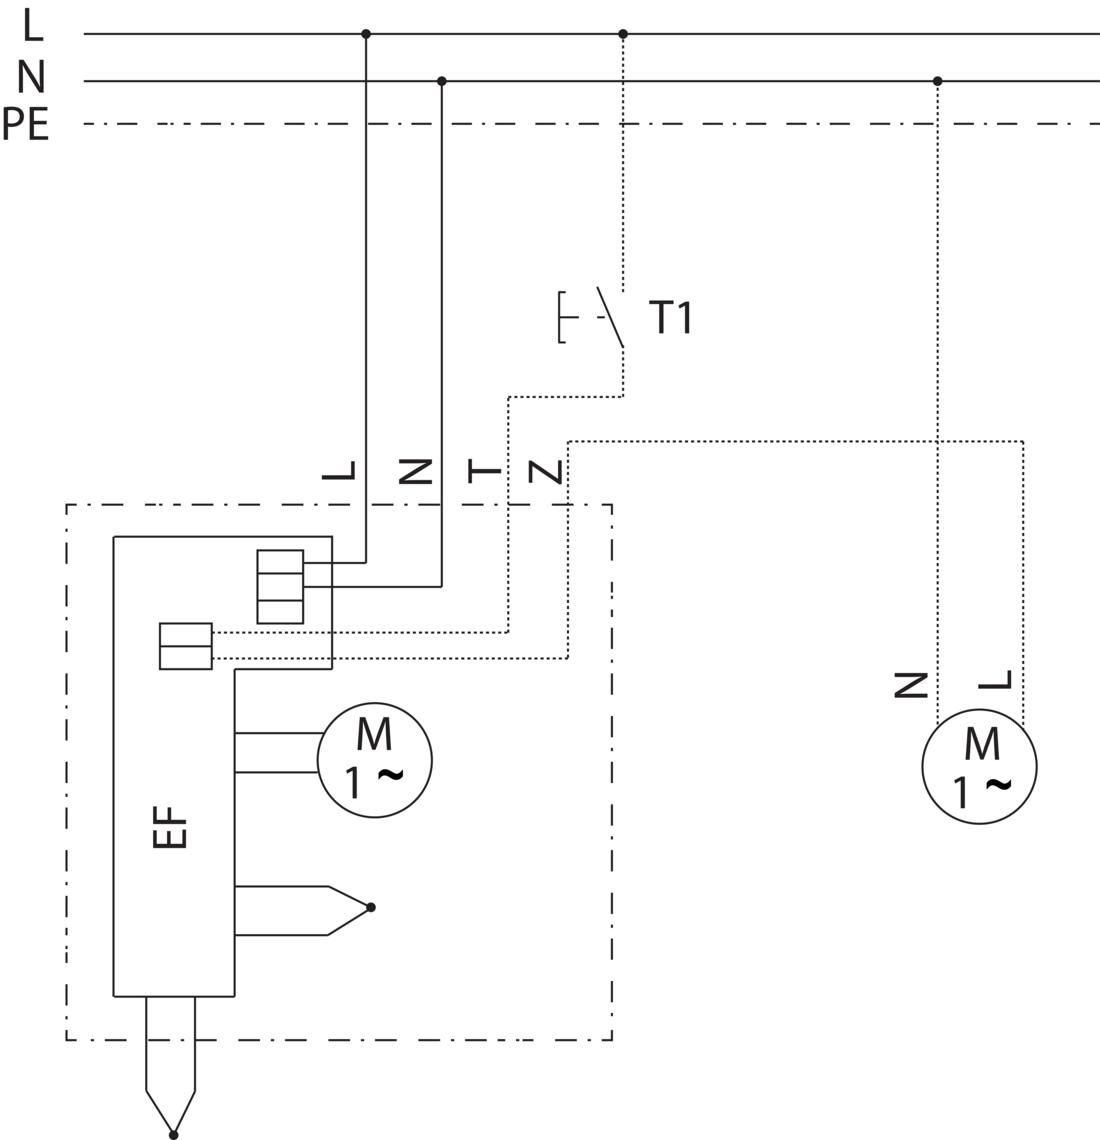 Ake 100 Maico Dehumidifier Wiring Diagram Ef Dehumidification Control